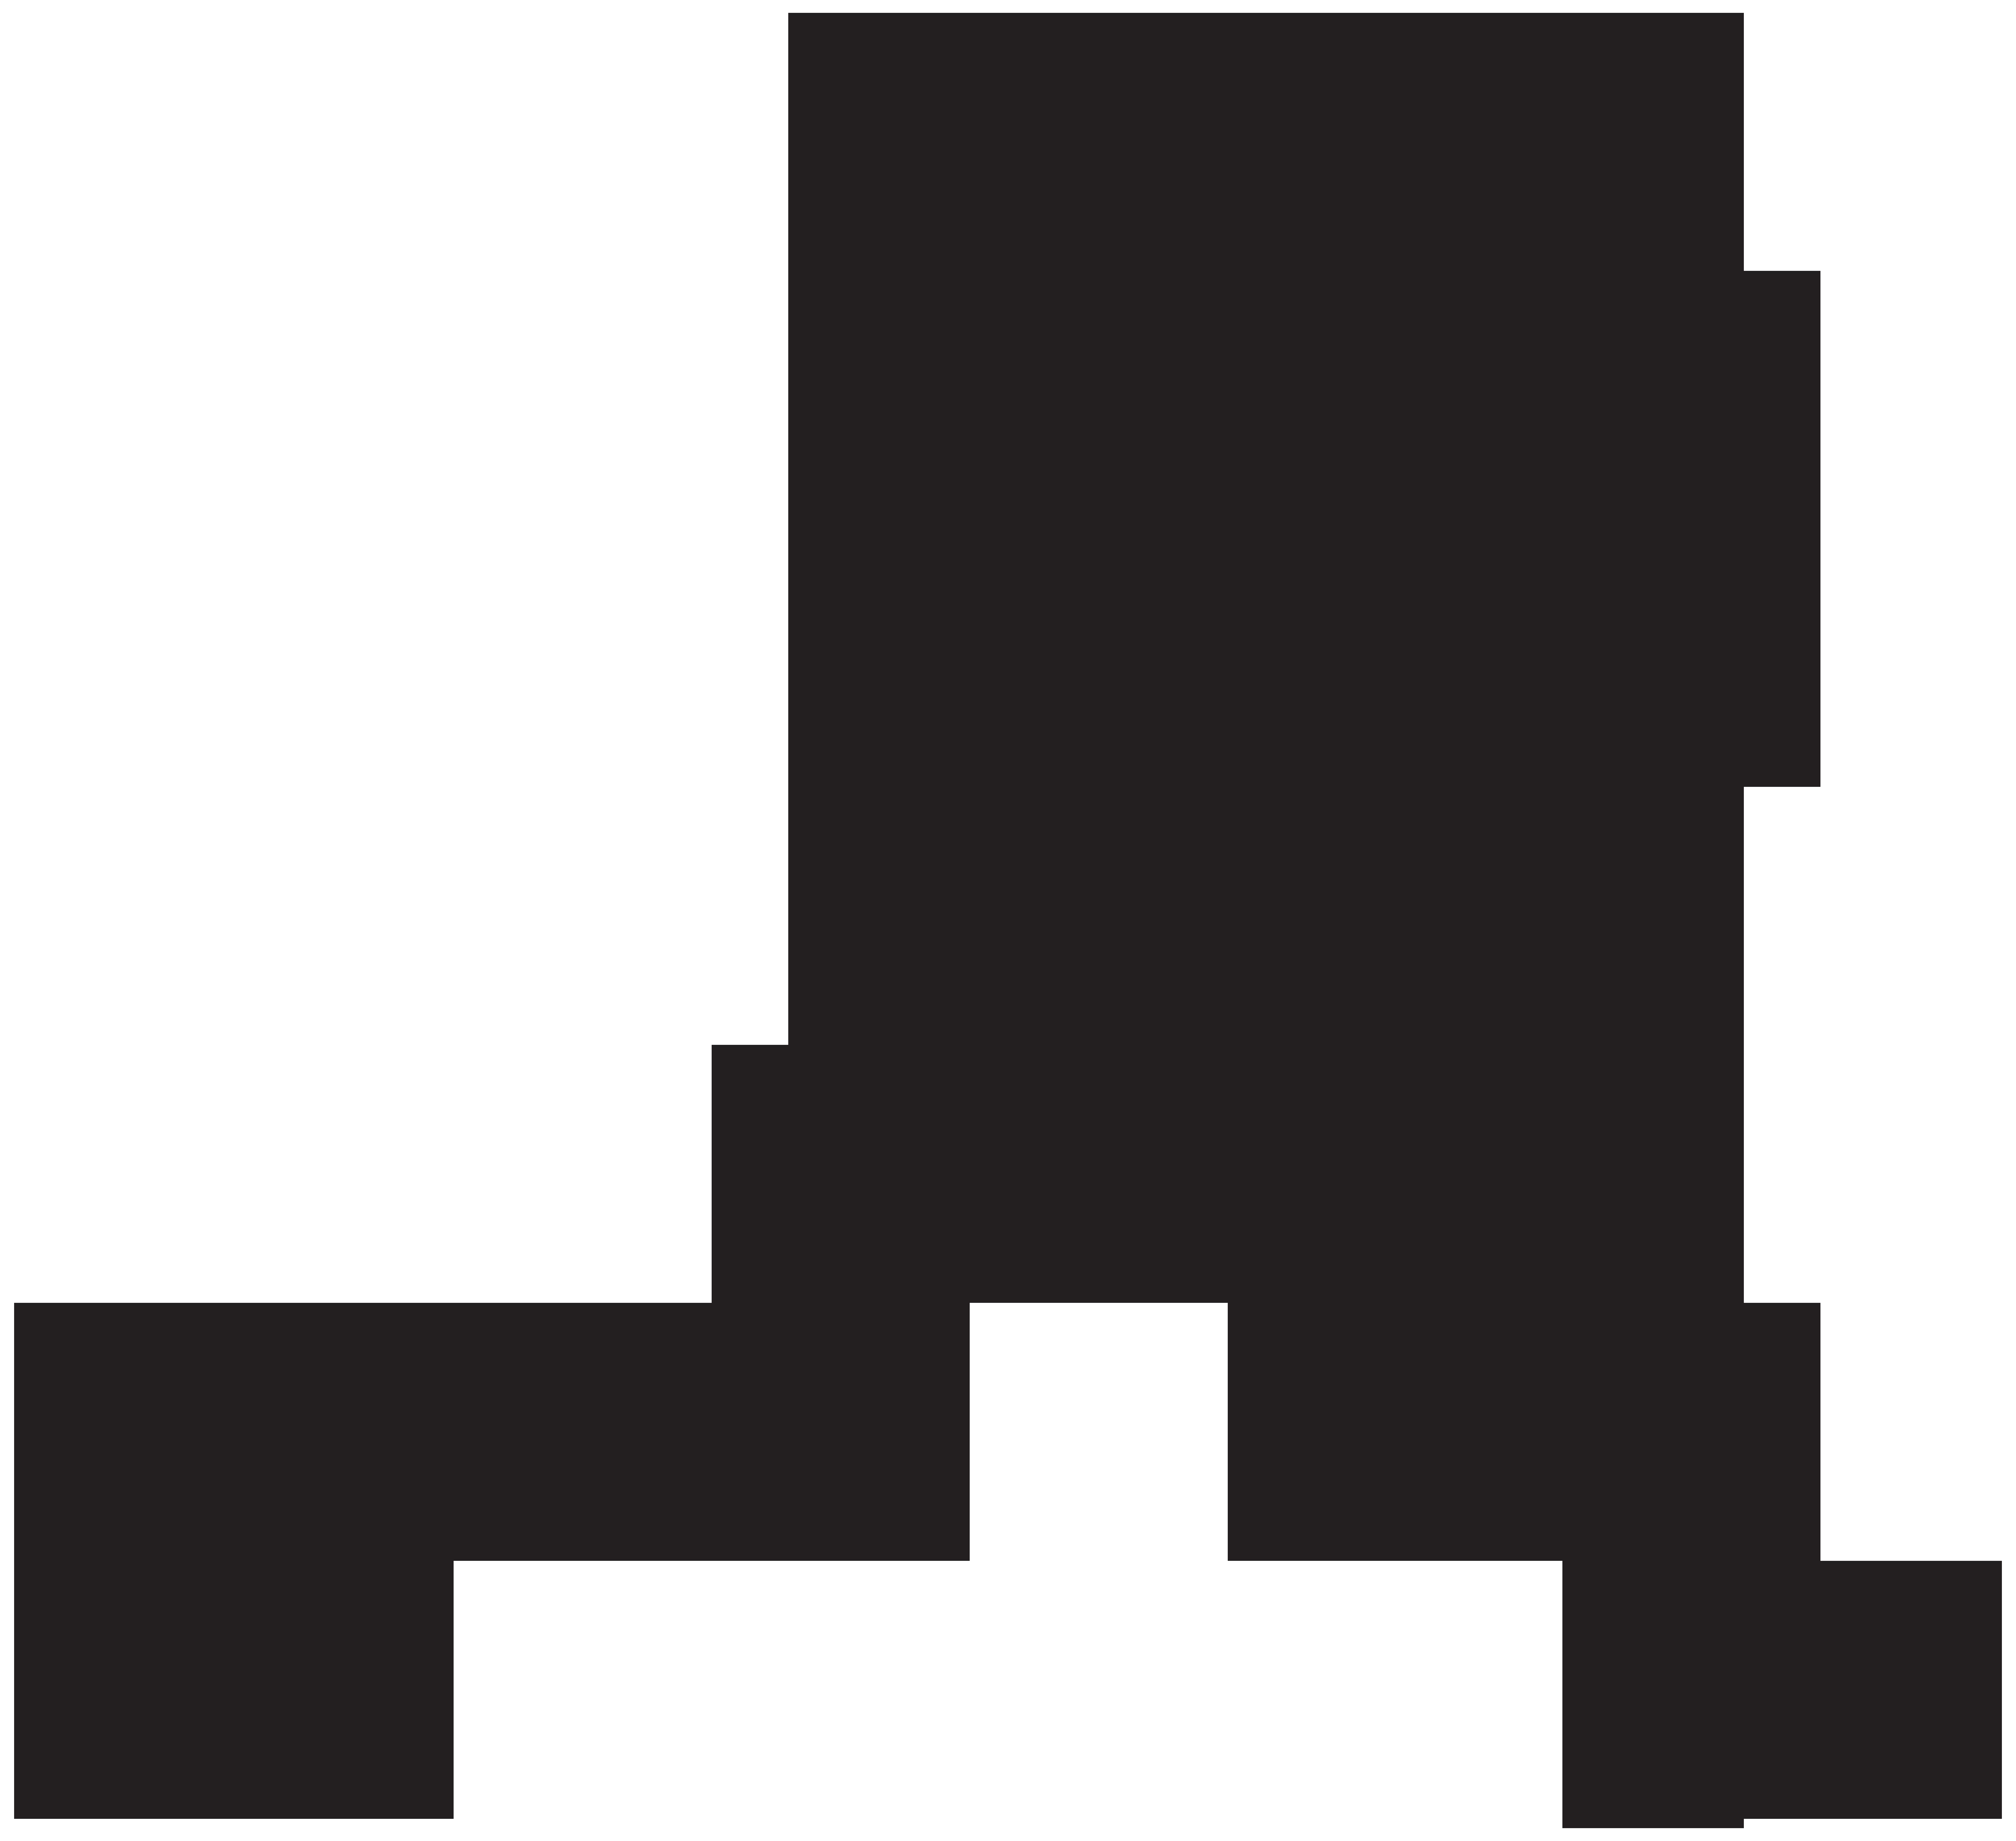 clipart grass hockey